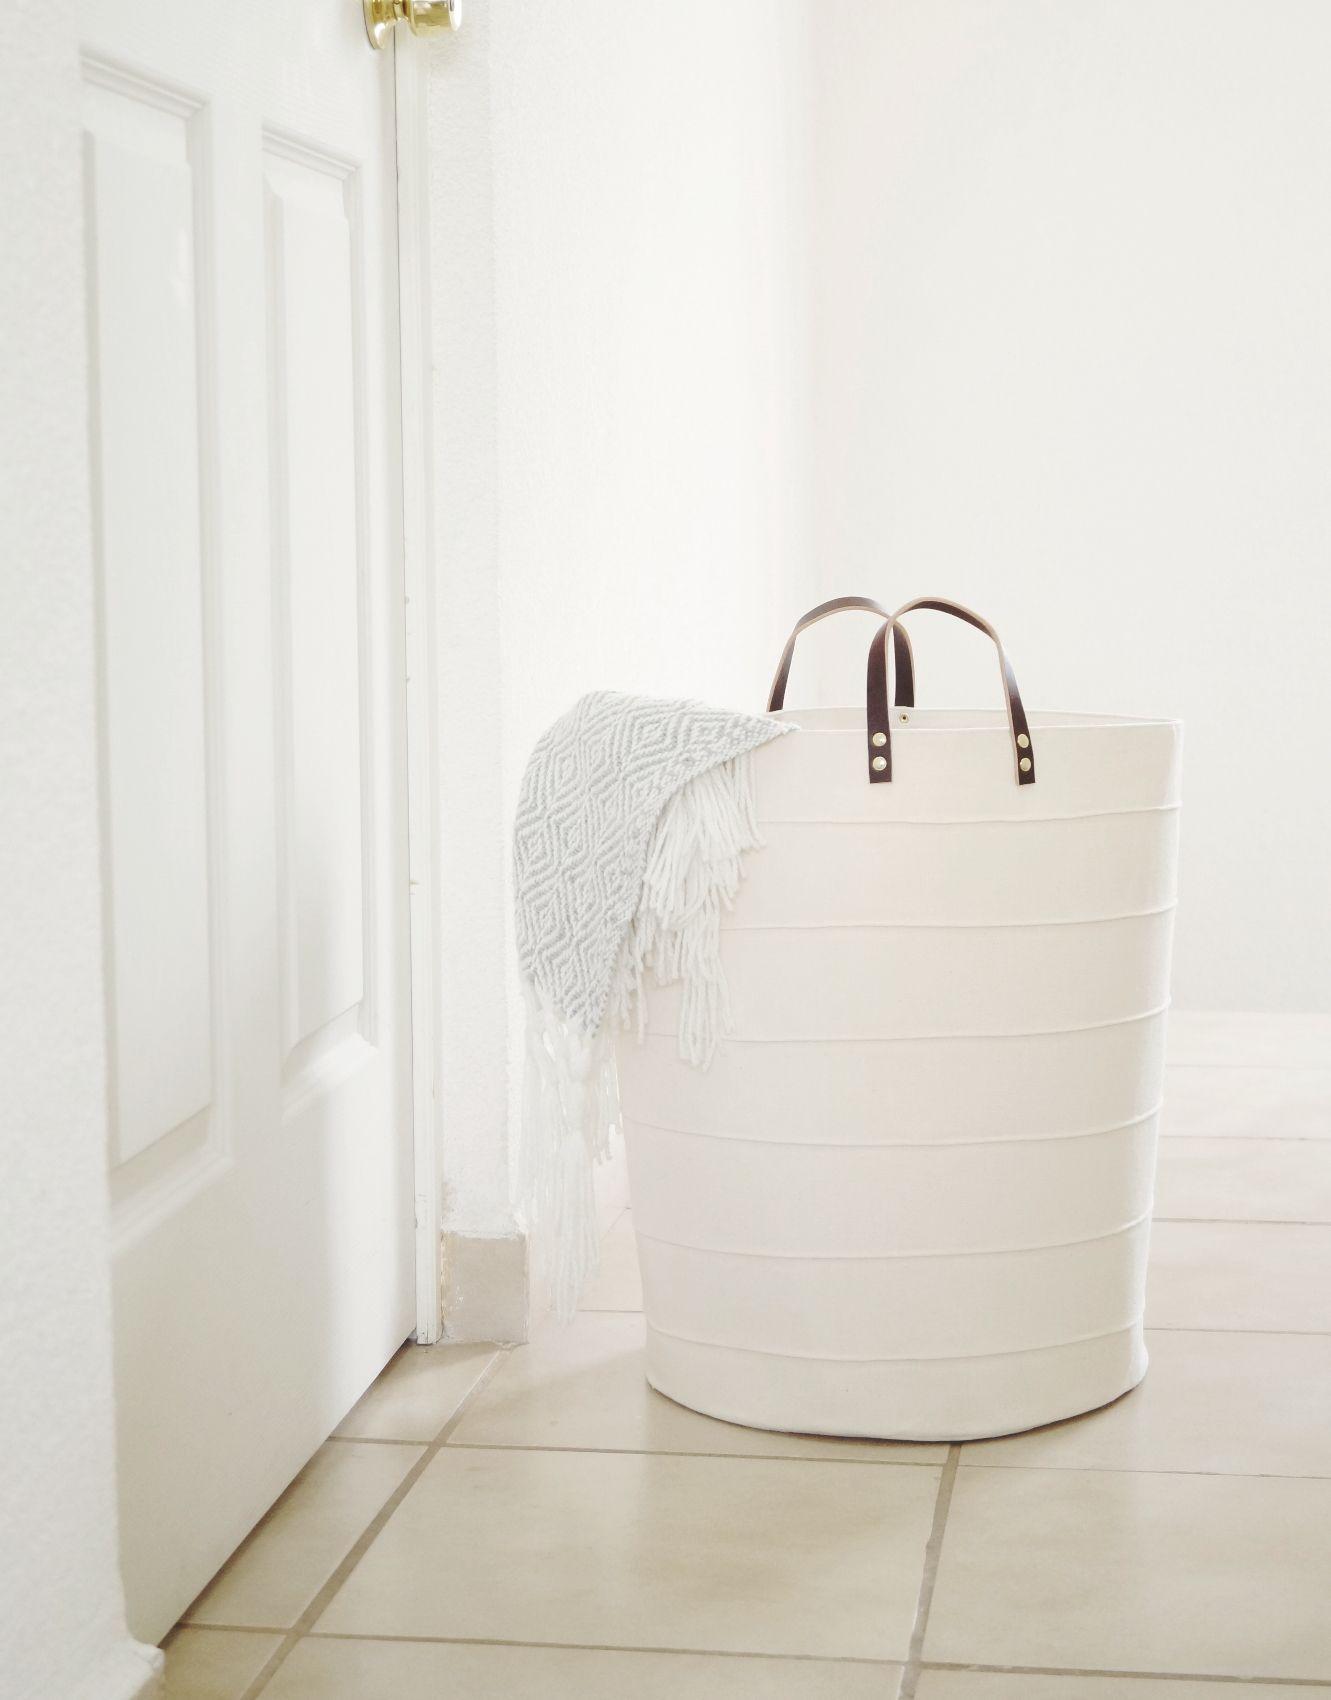 Laundry Hamper. White Toy Storage Basket. Laundry Room Decor. Kids Room,  Baby